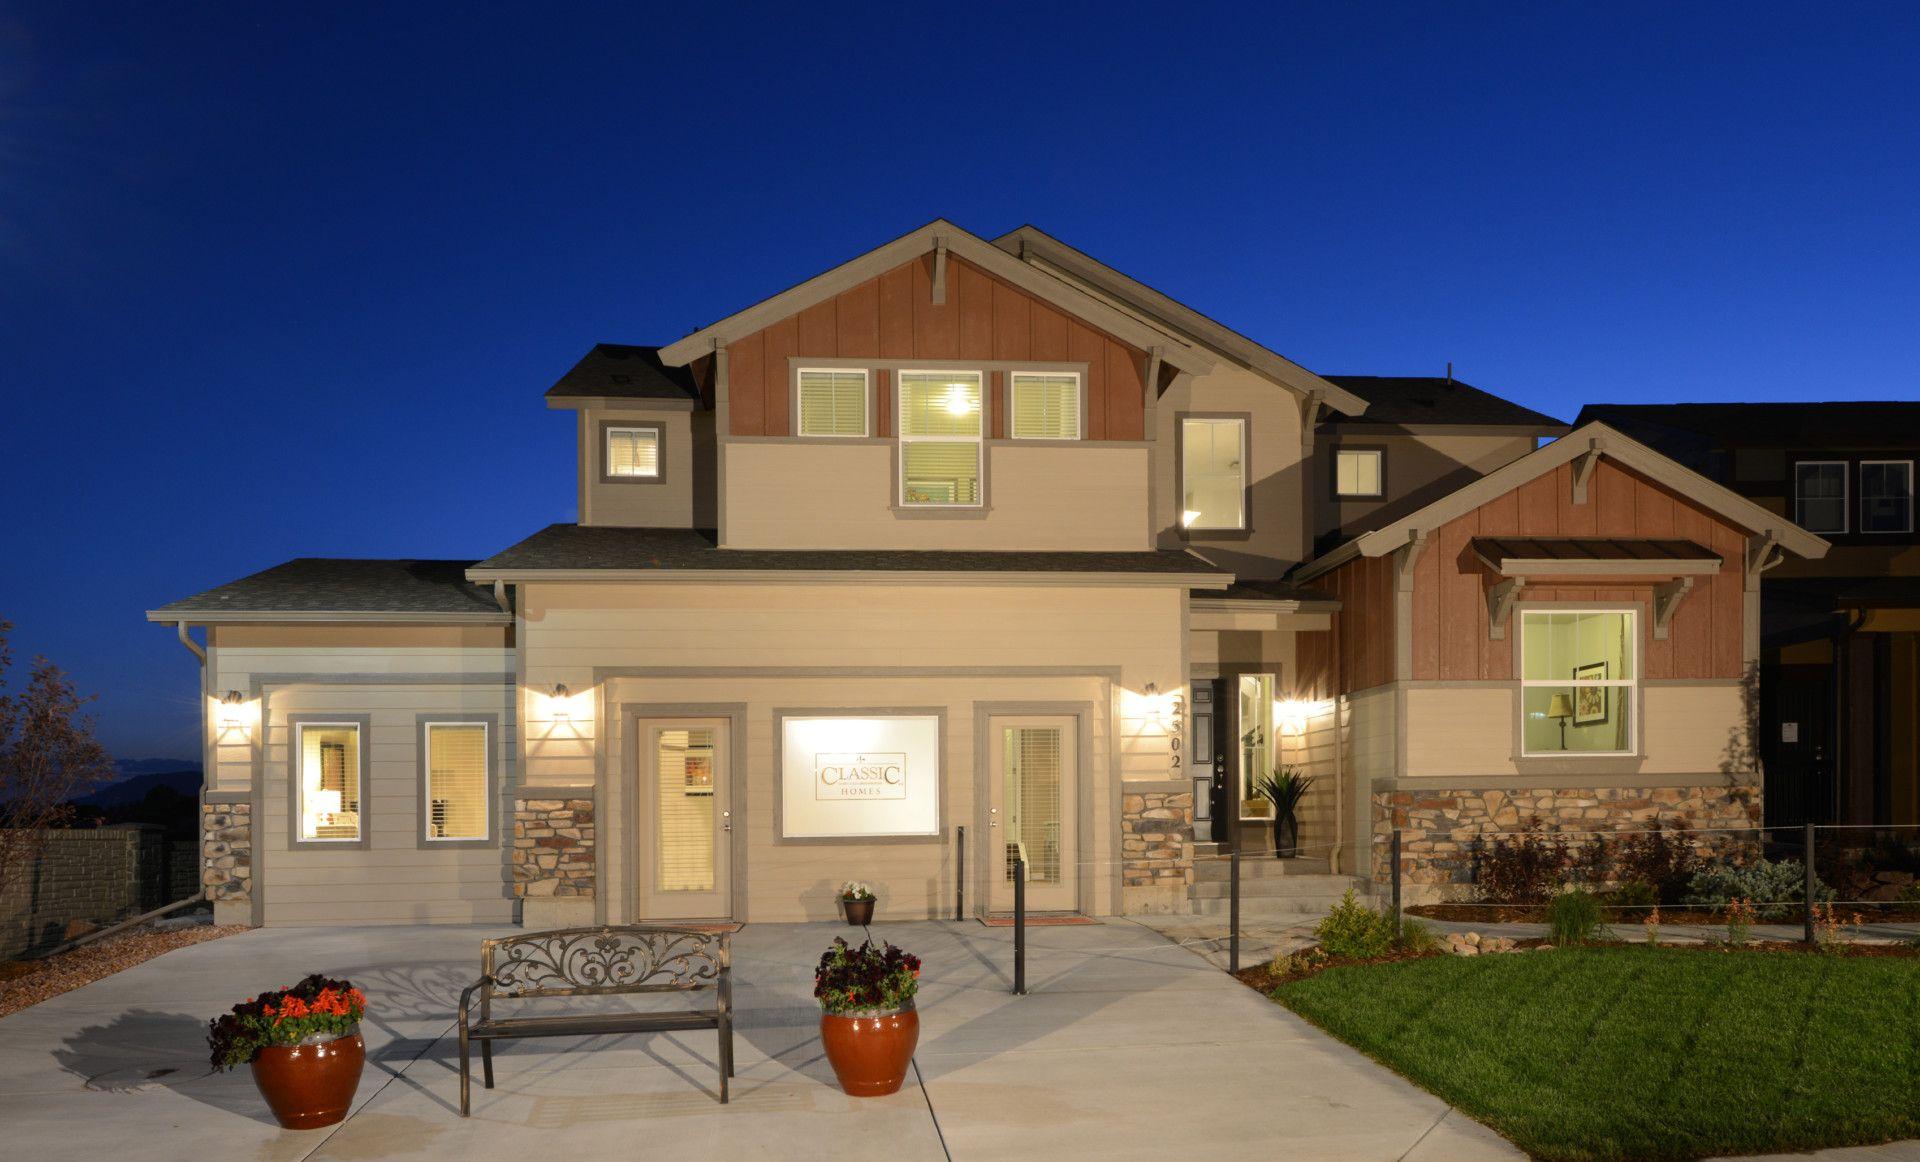 Classic homes colorado springs floor plans Home plan – Classic Home Floor Plans